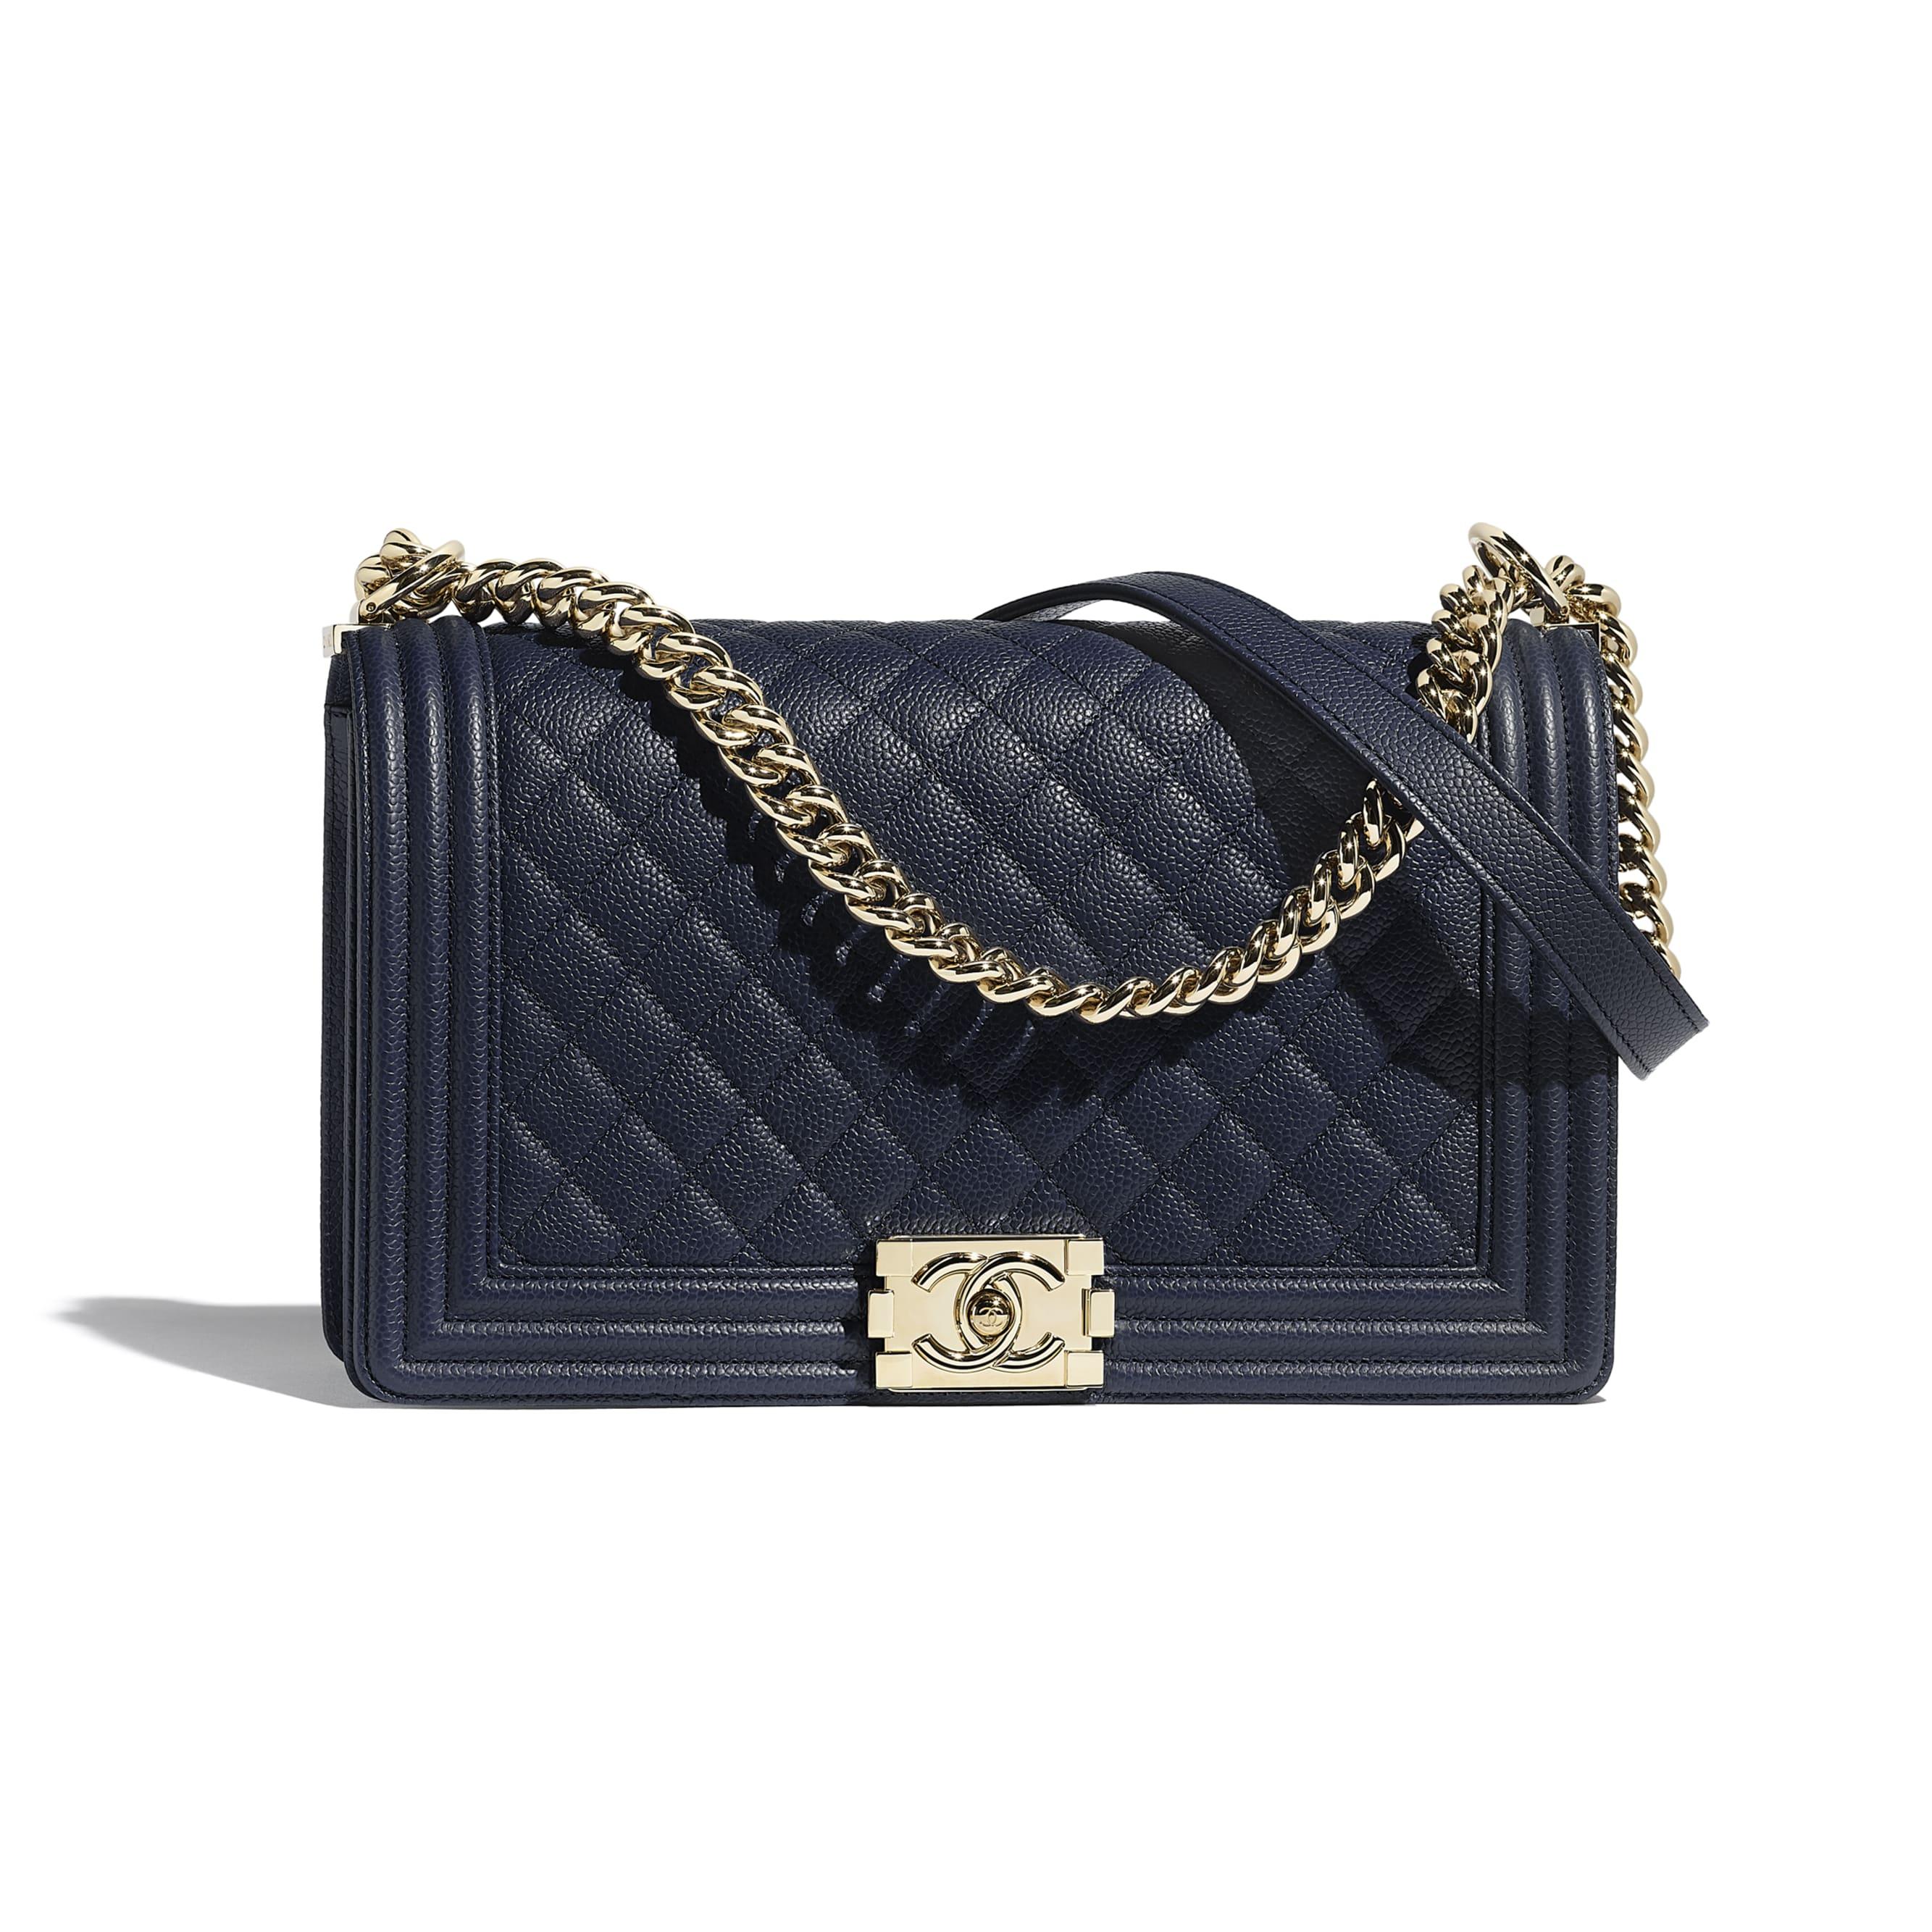 Large BOY CHANEL Handbag - Navy Blue - Grained Calfskin & Gold-Tone Metal - CHANEL - Default view - see standard sized version